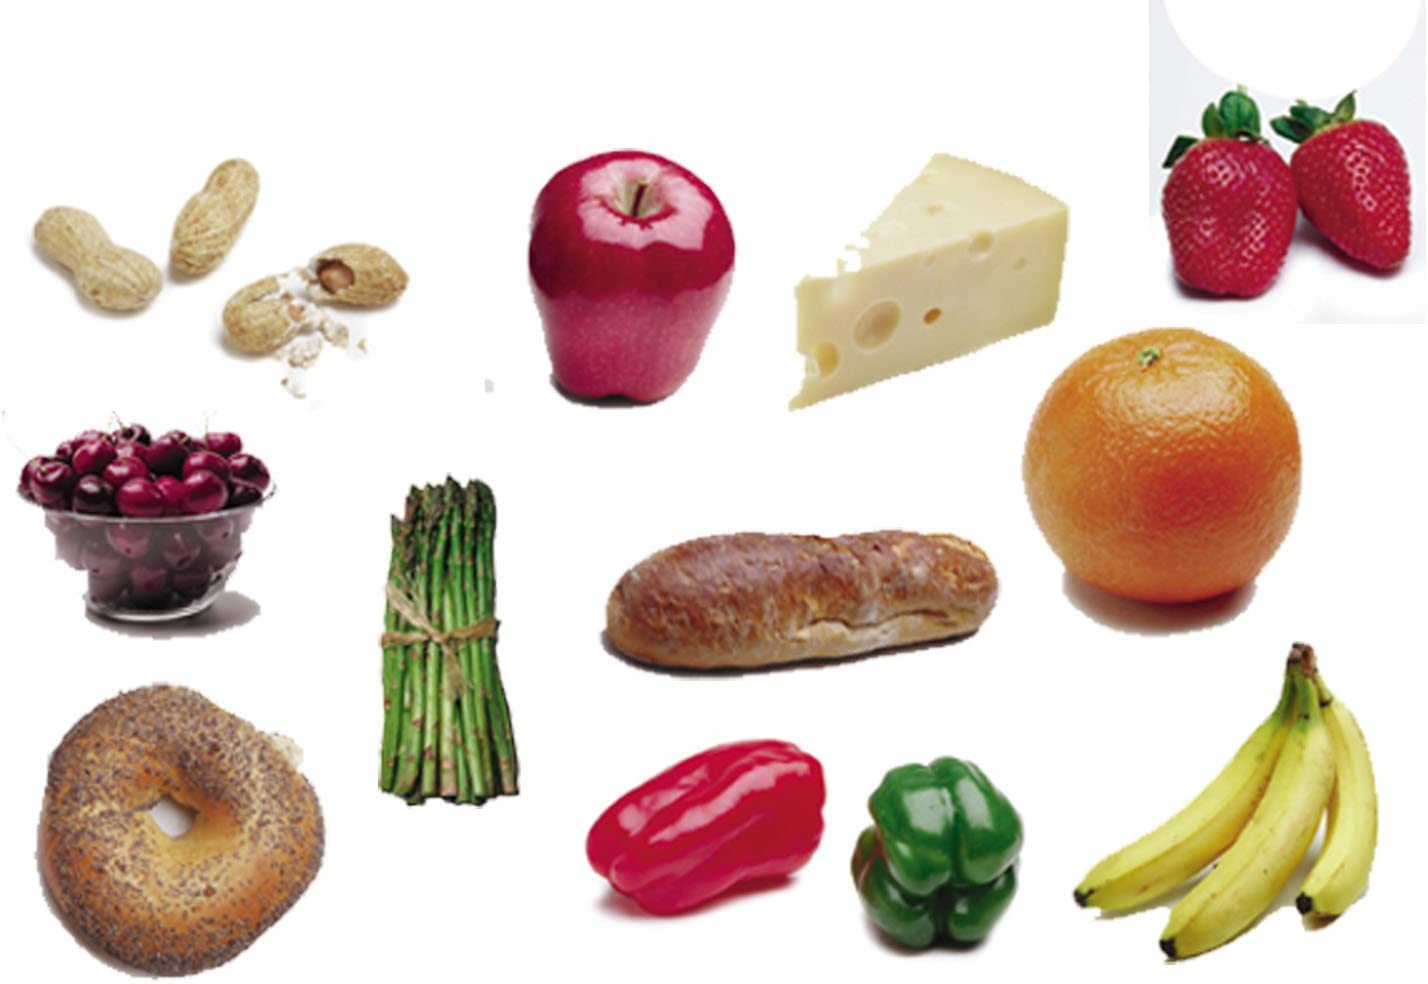 Eureka Nutritious Foods Deco Kit (840380)